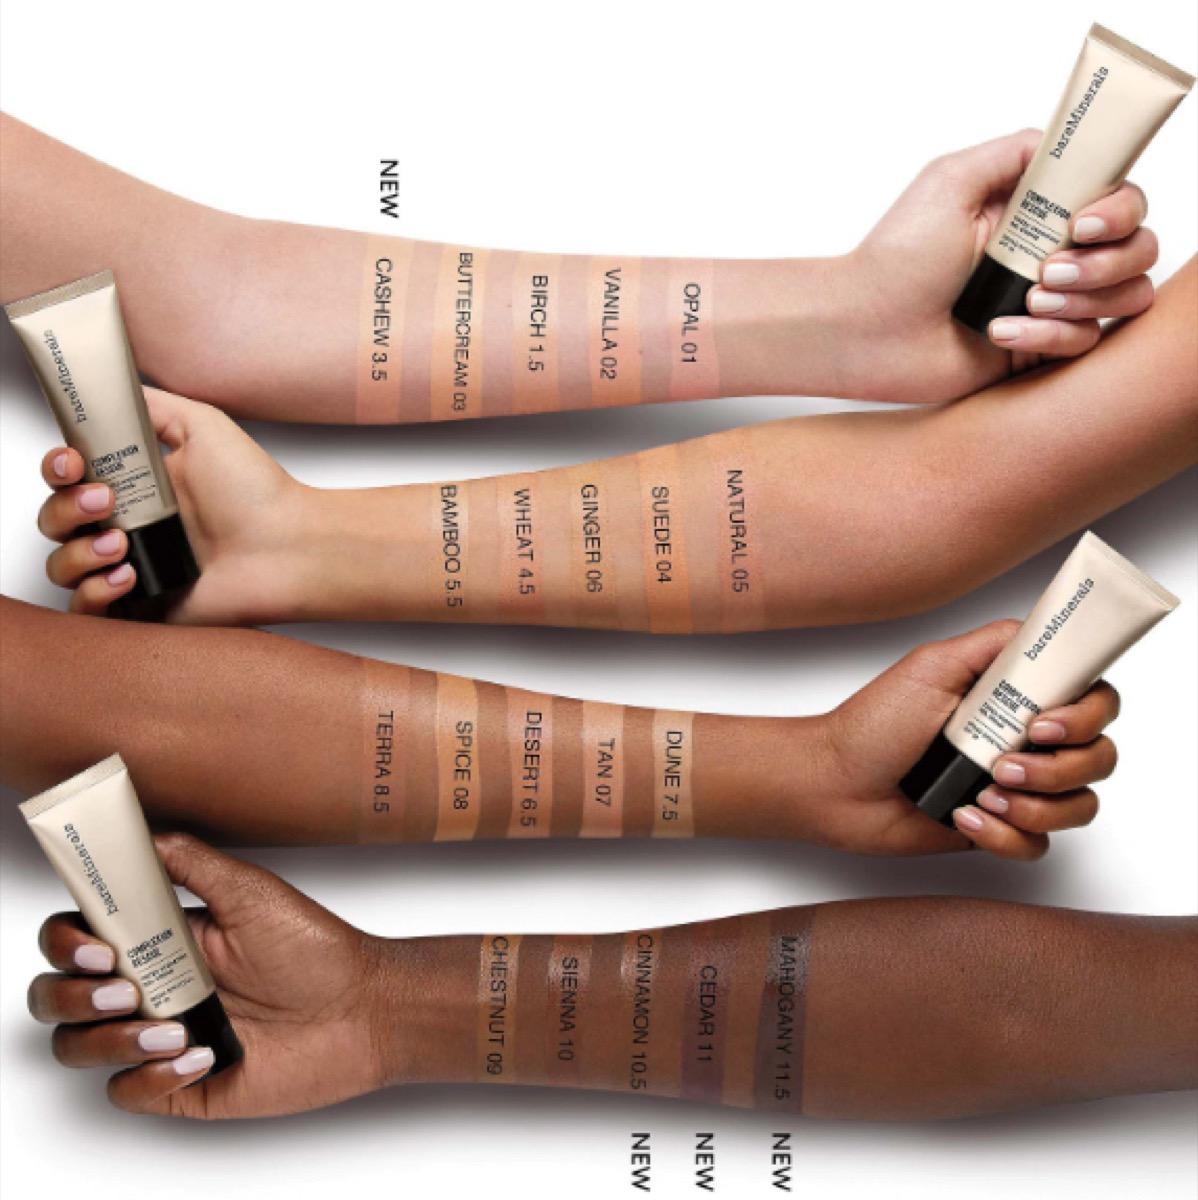 bareminerals complexion rescue tinted moisturizer